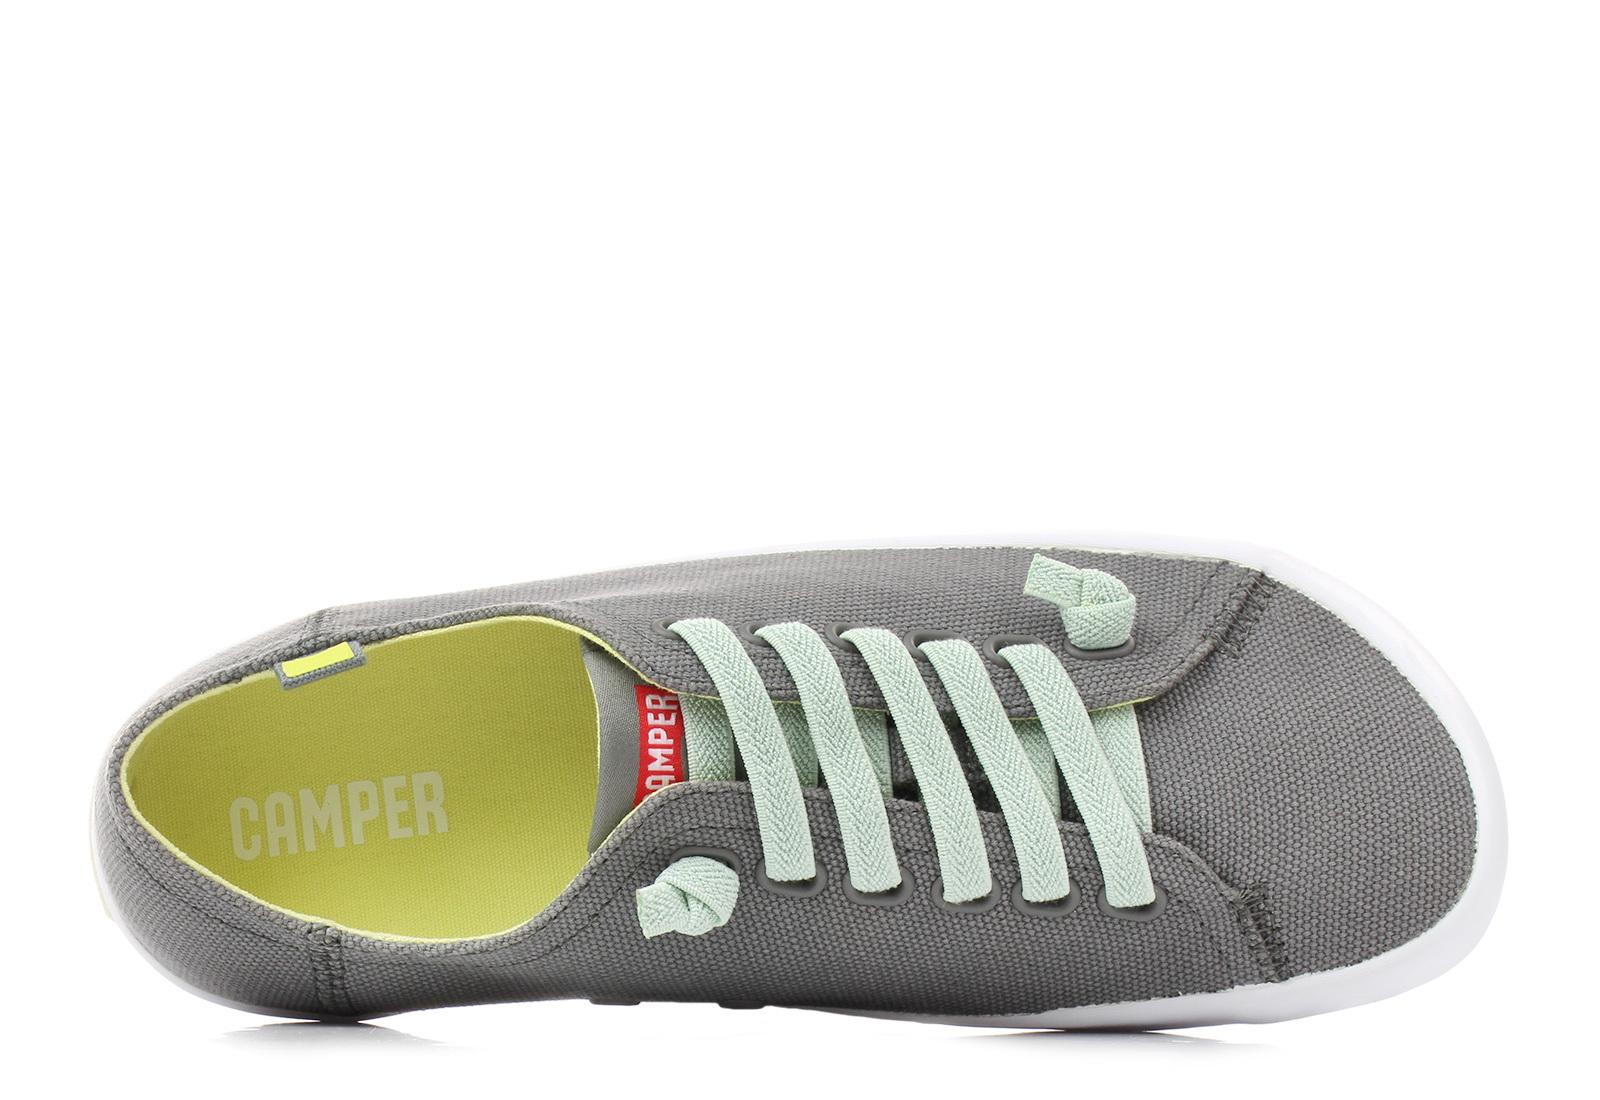 Camper Shoes Peu Rambla Vulcanizado 21897 046 Online shop for sneakers, shoes and boots